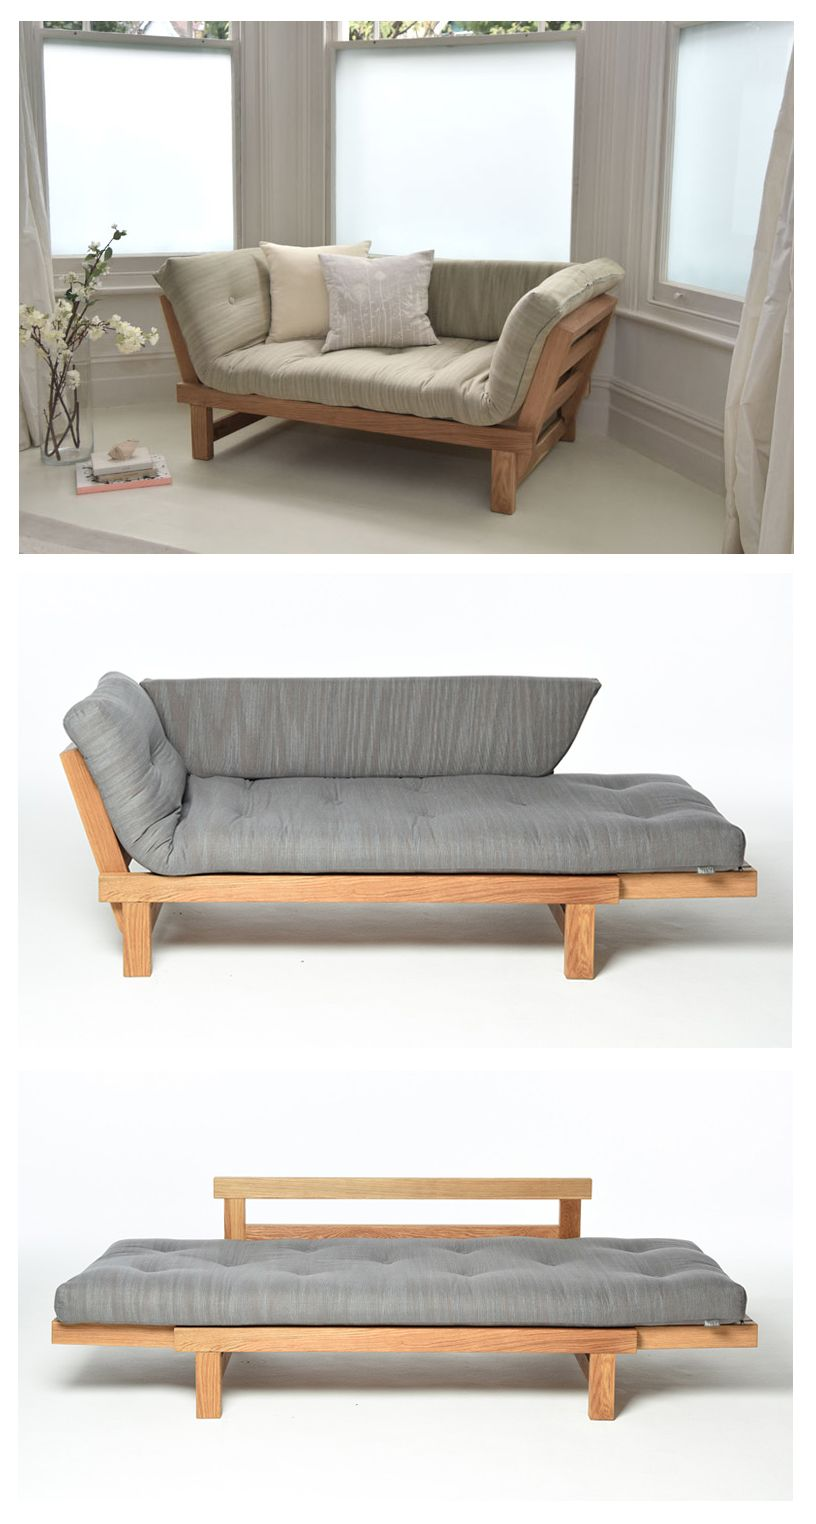 Oak Wooden Cute Sofa Bed Futon Company Sofa Bed Design Furniture Bed Design